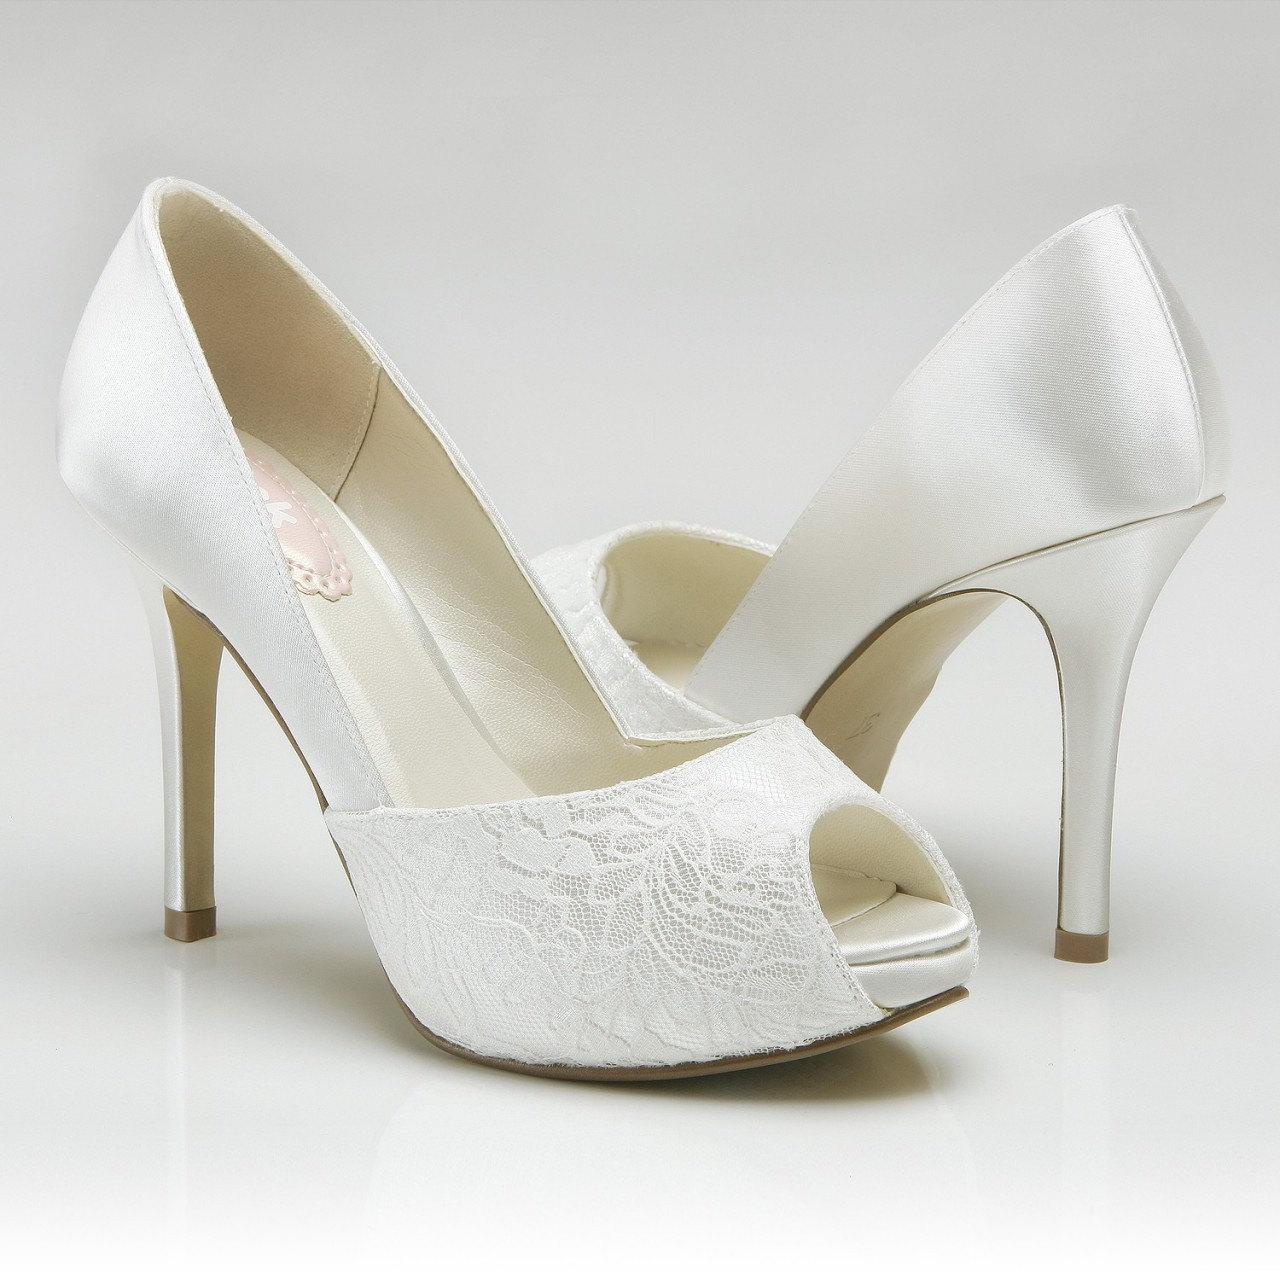 bridal shoes high heels photo - 1